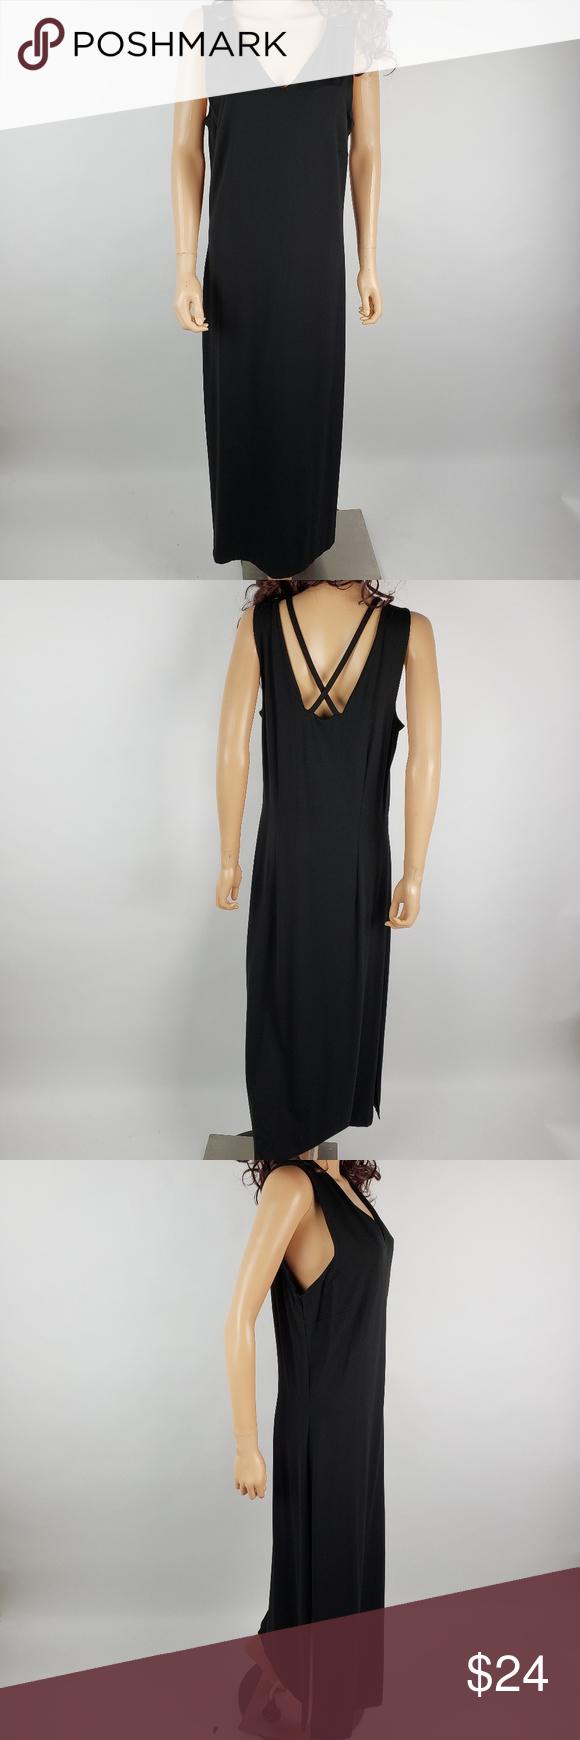 Talbots Black Maxi Dress Black Maxi Dress Clothes Design Talbots Dress [ 1740 x 580 Pixel ]